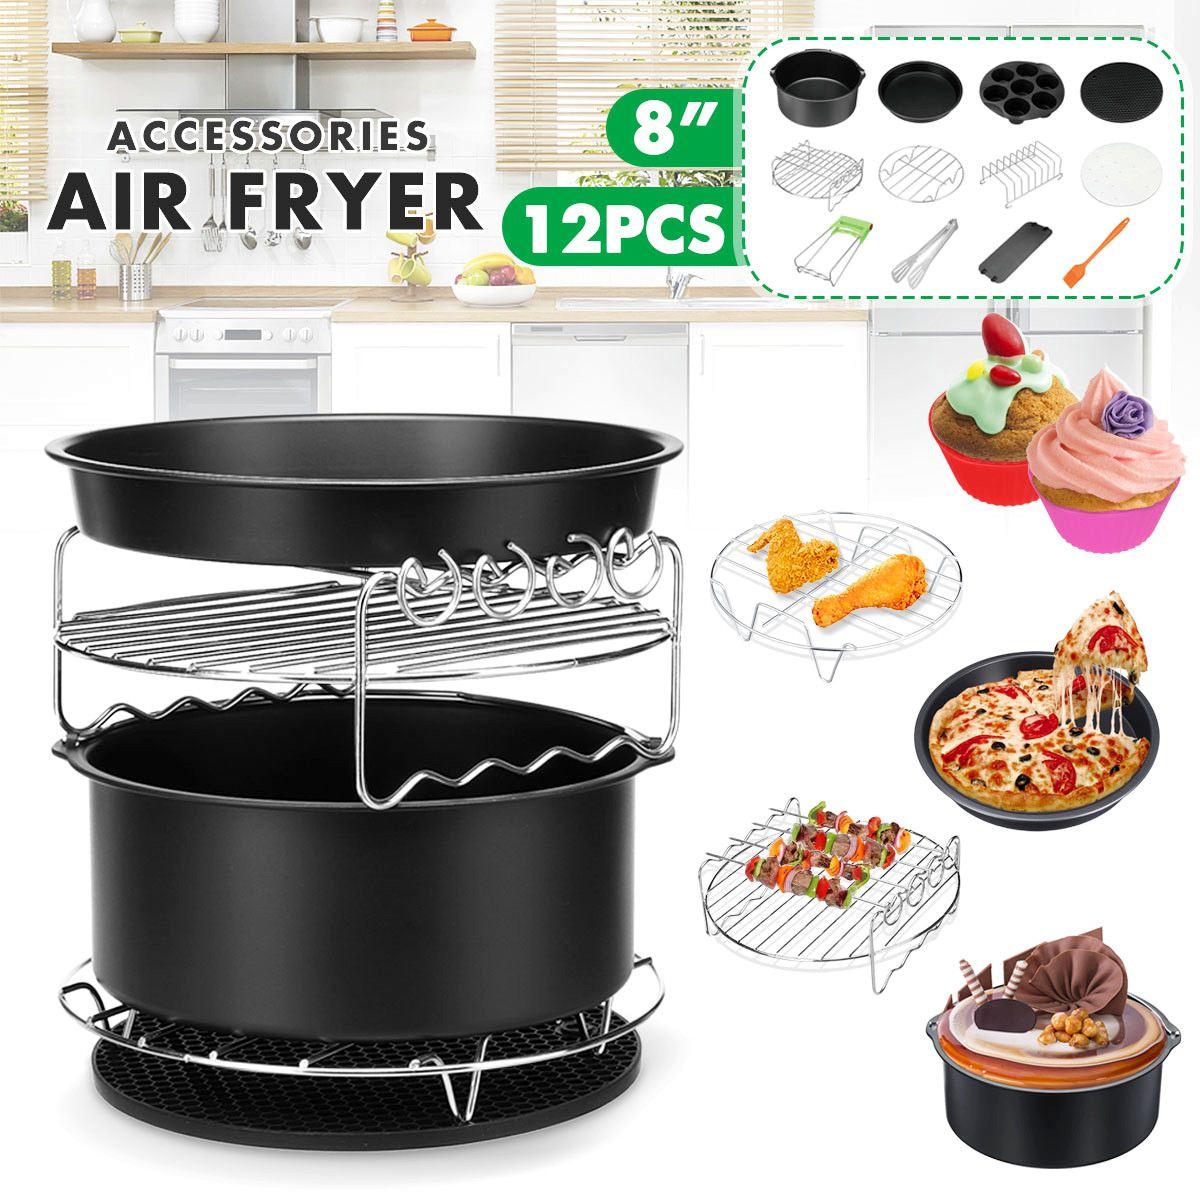 12 In 1 8 Inch Air Fryer Accessories Fit all Air fryer  4.2QT-5.3QT-5.8QT-6.8QT Kitchen Cooking Baking Tools Dropshipping 201912 In 1 8 Inch Air Fryer Accessories Fit all Air fryer  4.2QT-5.3QT-5.8QT-6.8QT Kitchen Cooking Baking Tools Dropshipping 2019